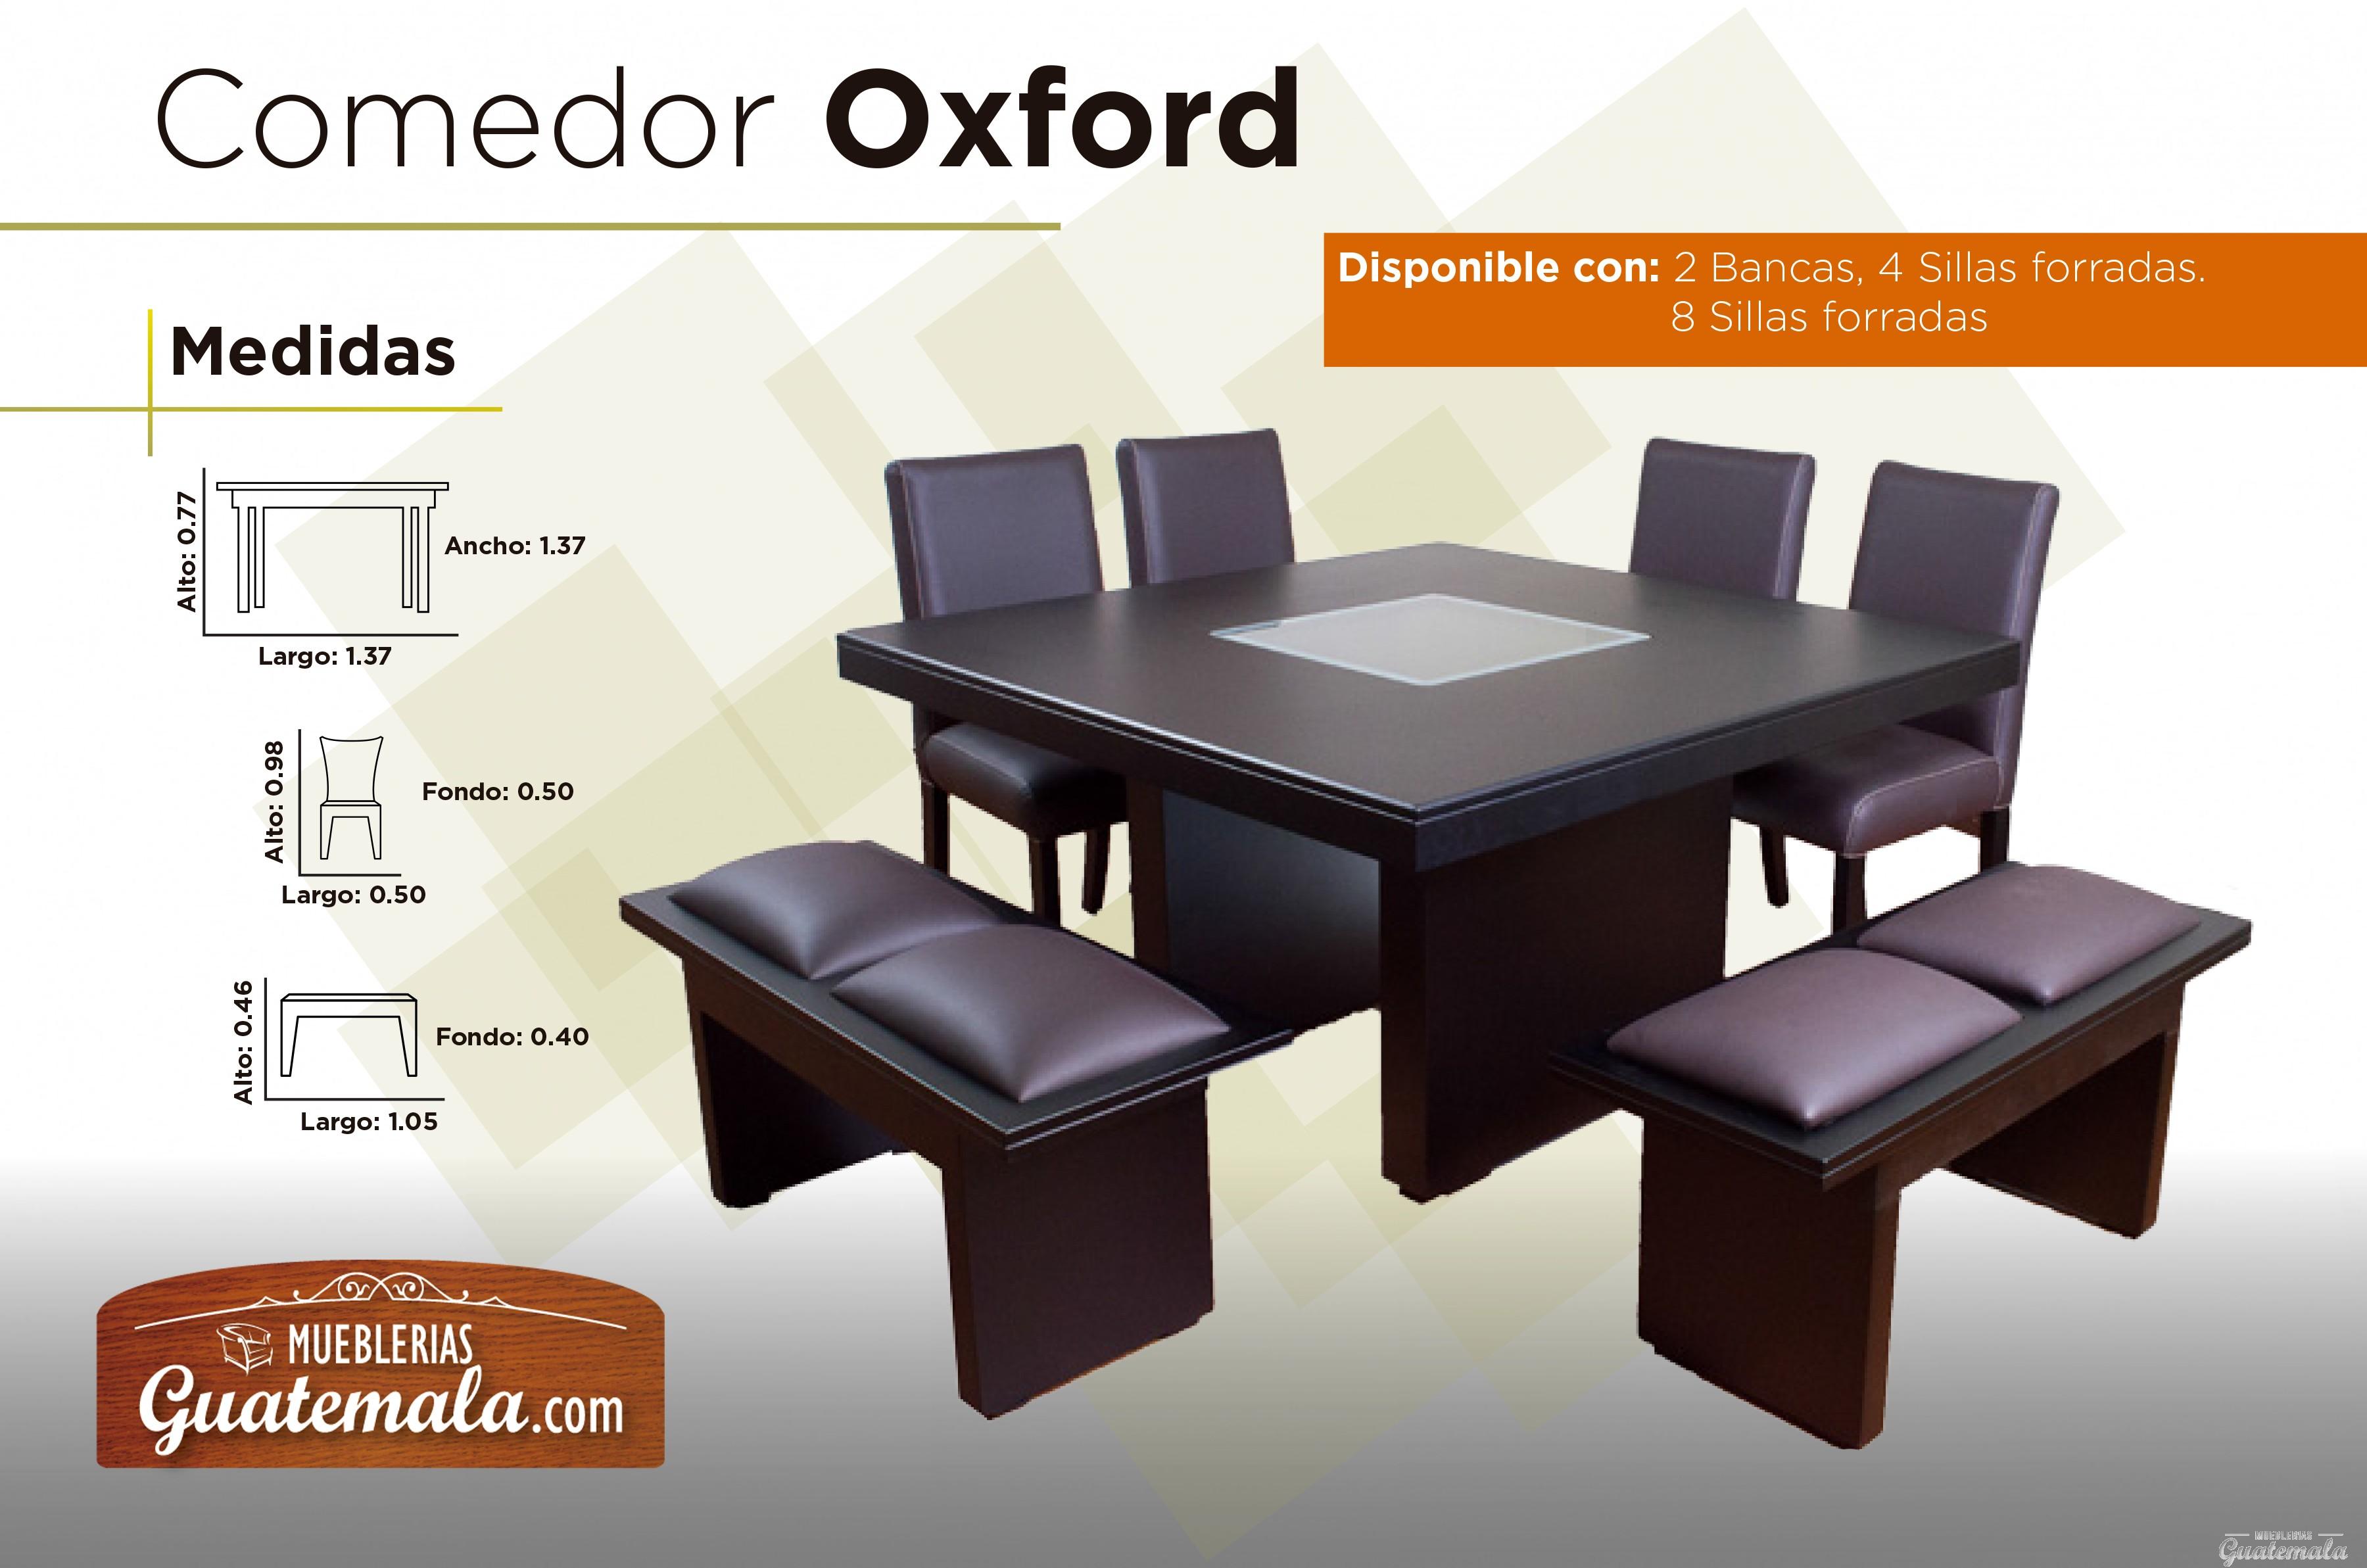 Comedor Oxford